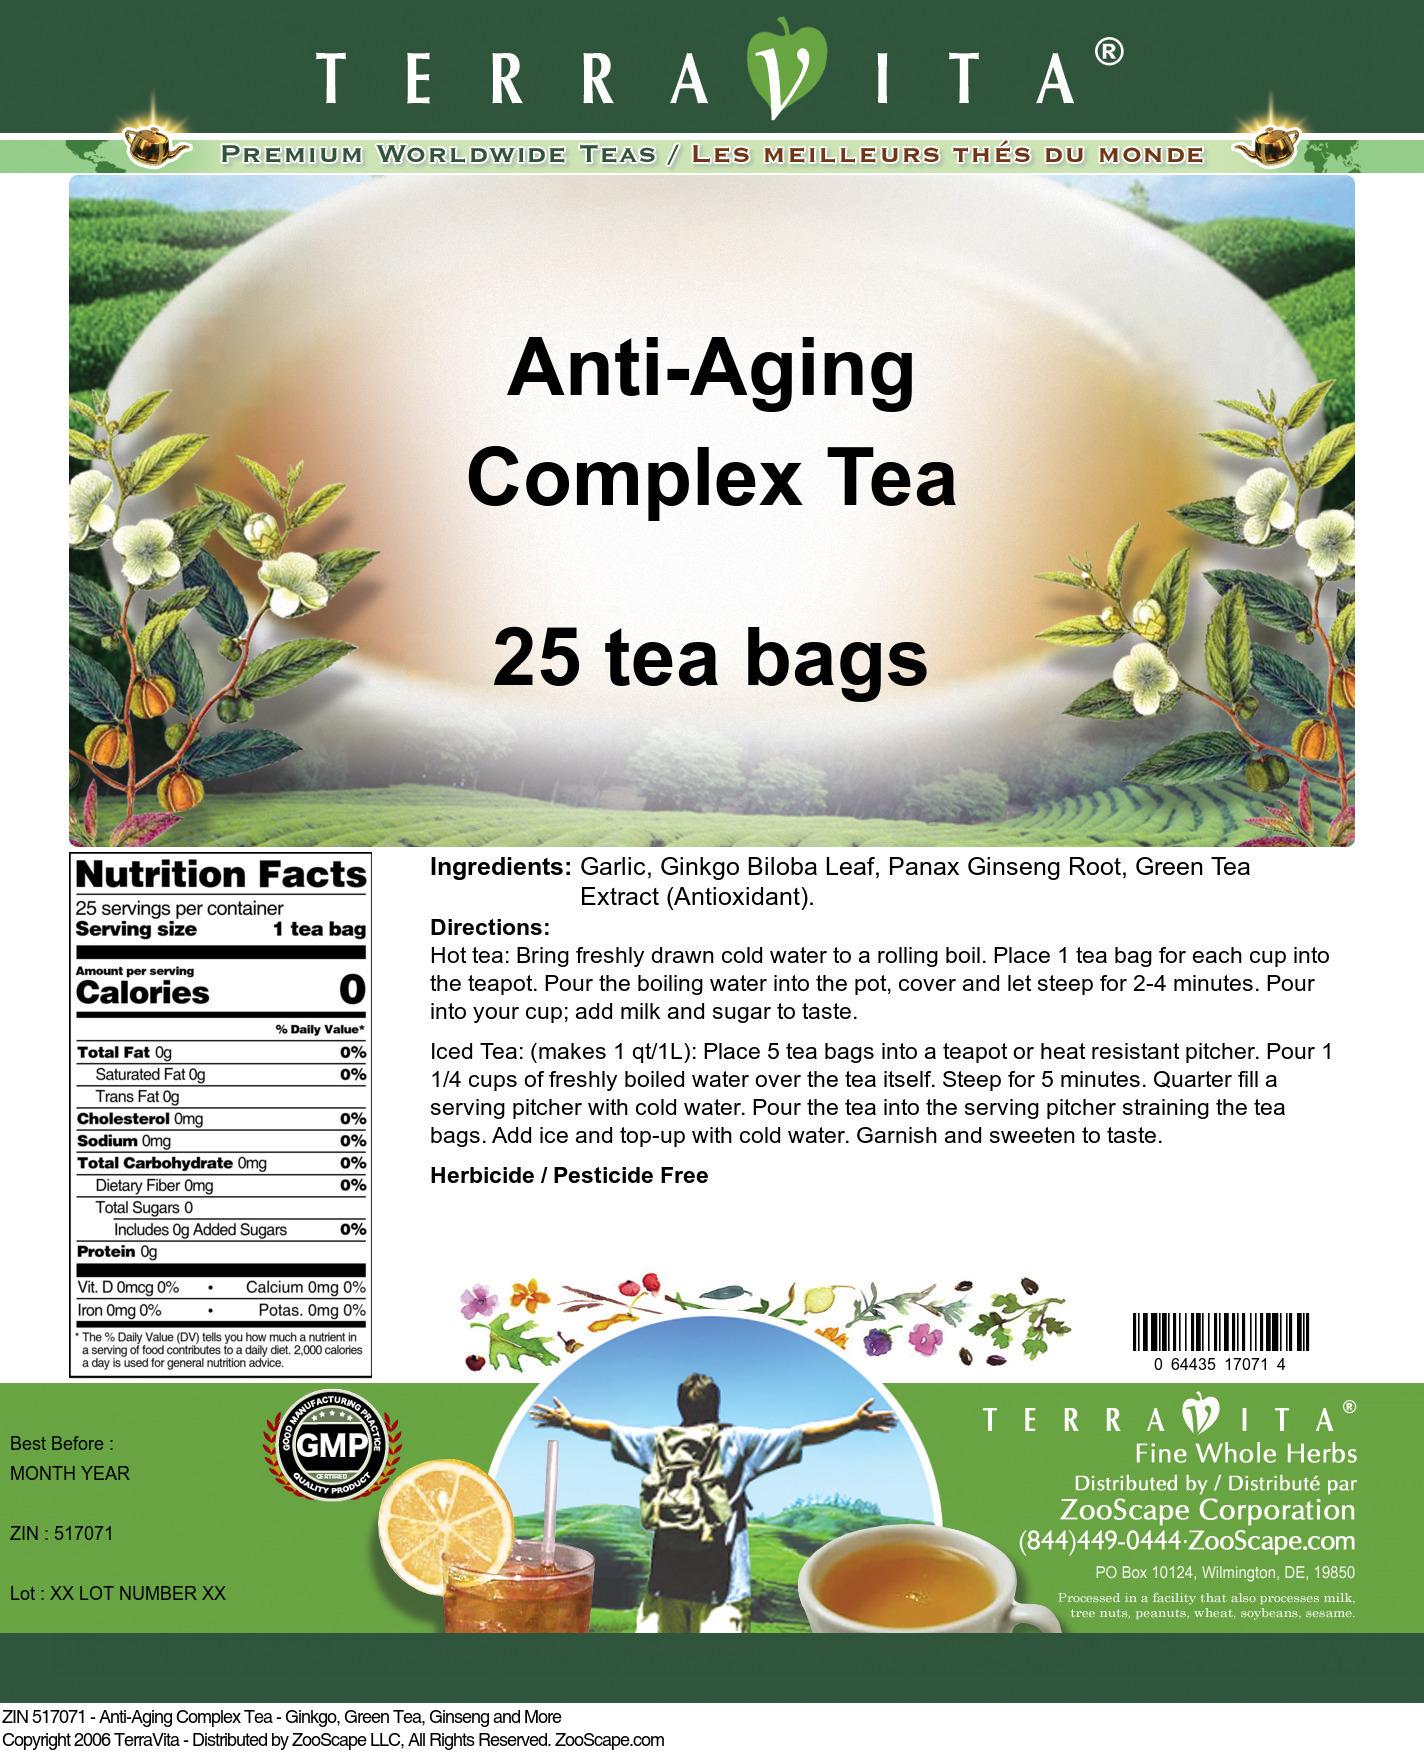 Anti-Aging Complex